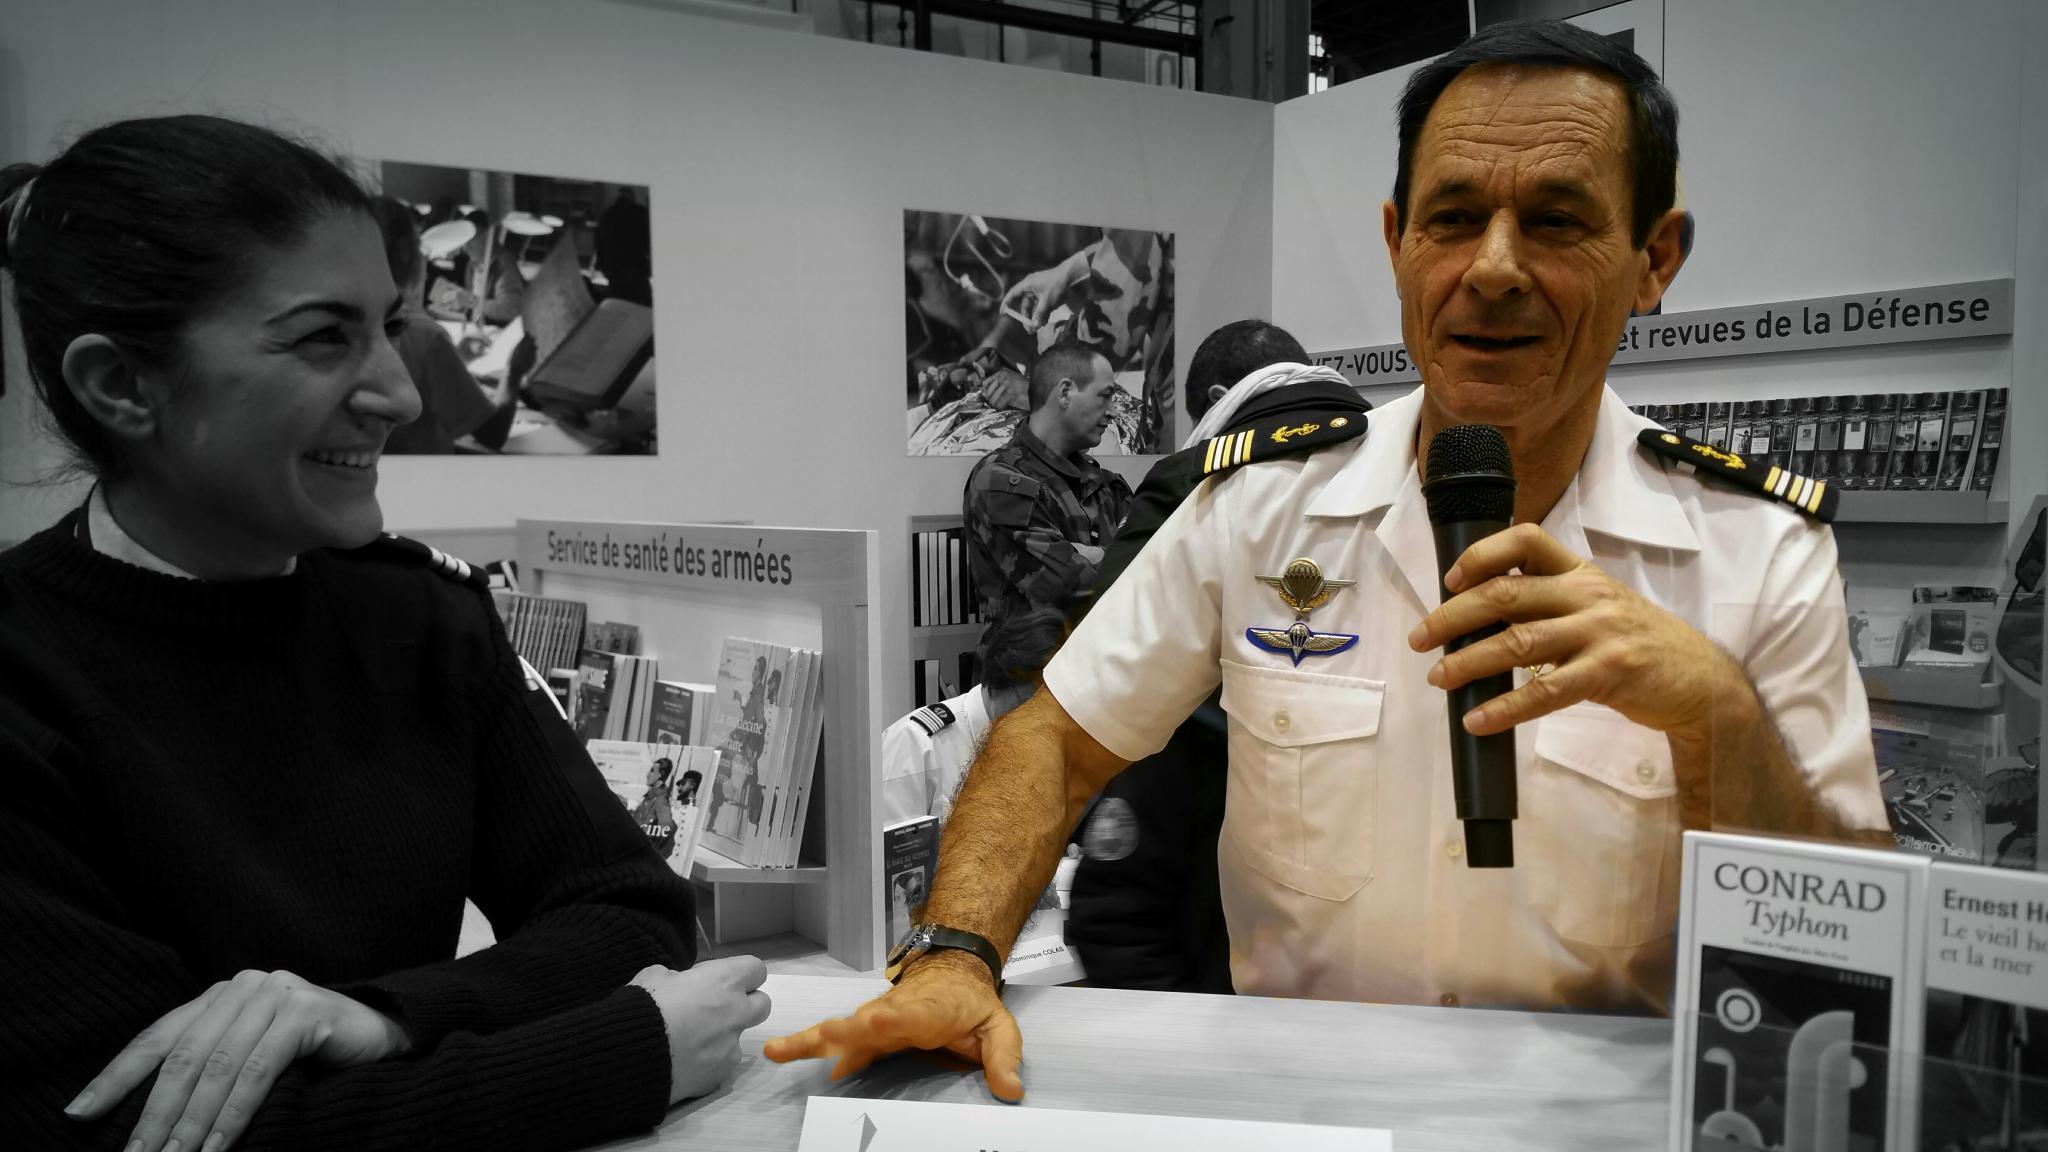 entretien,patrice franceschi,marin,kurde,aventure,littérature,ecrivain de marine,charles-de gaulle,porte avions,marine